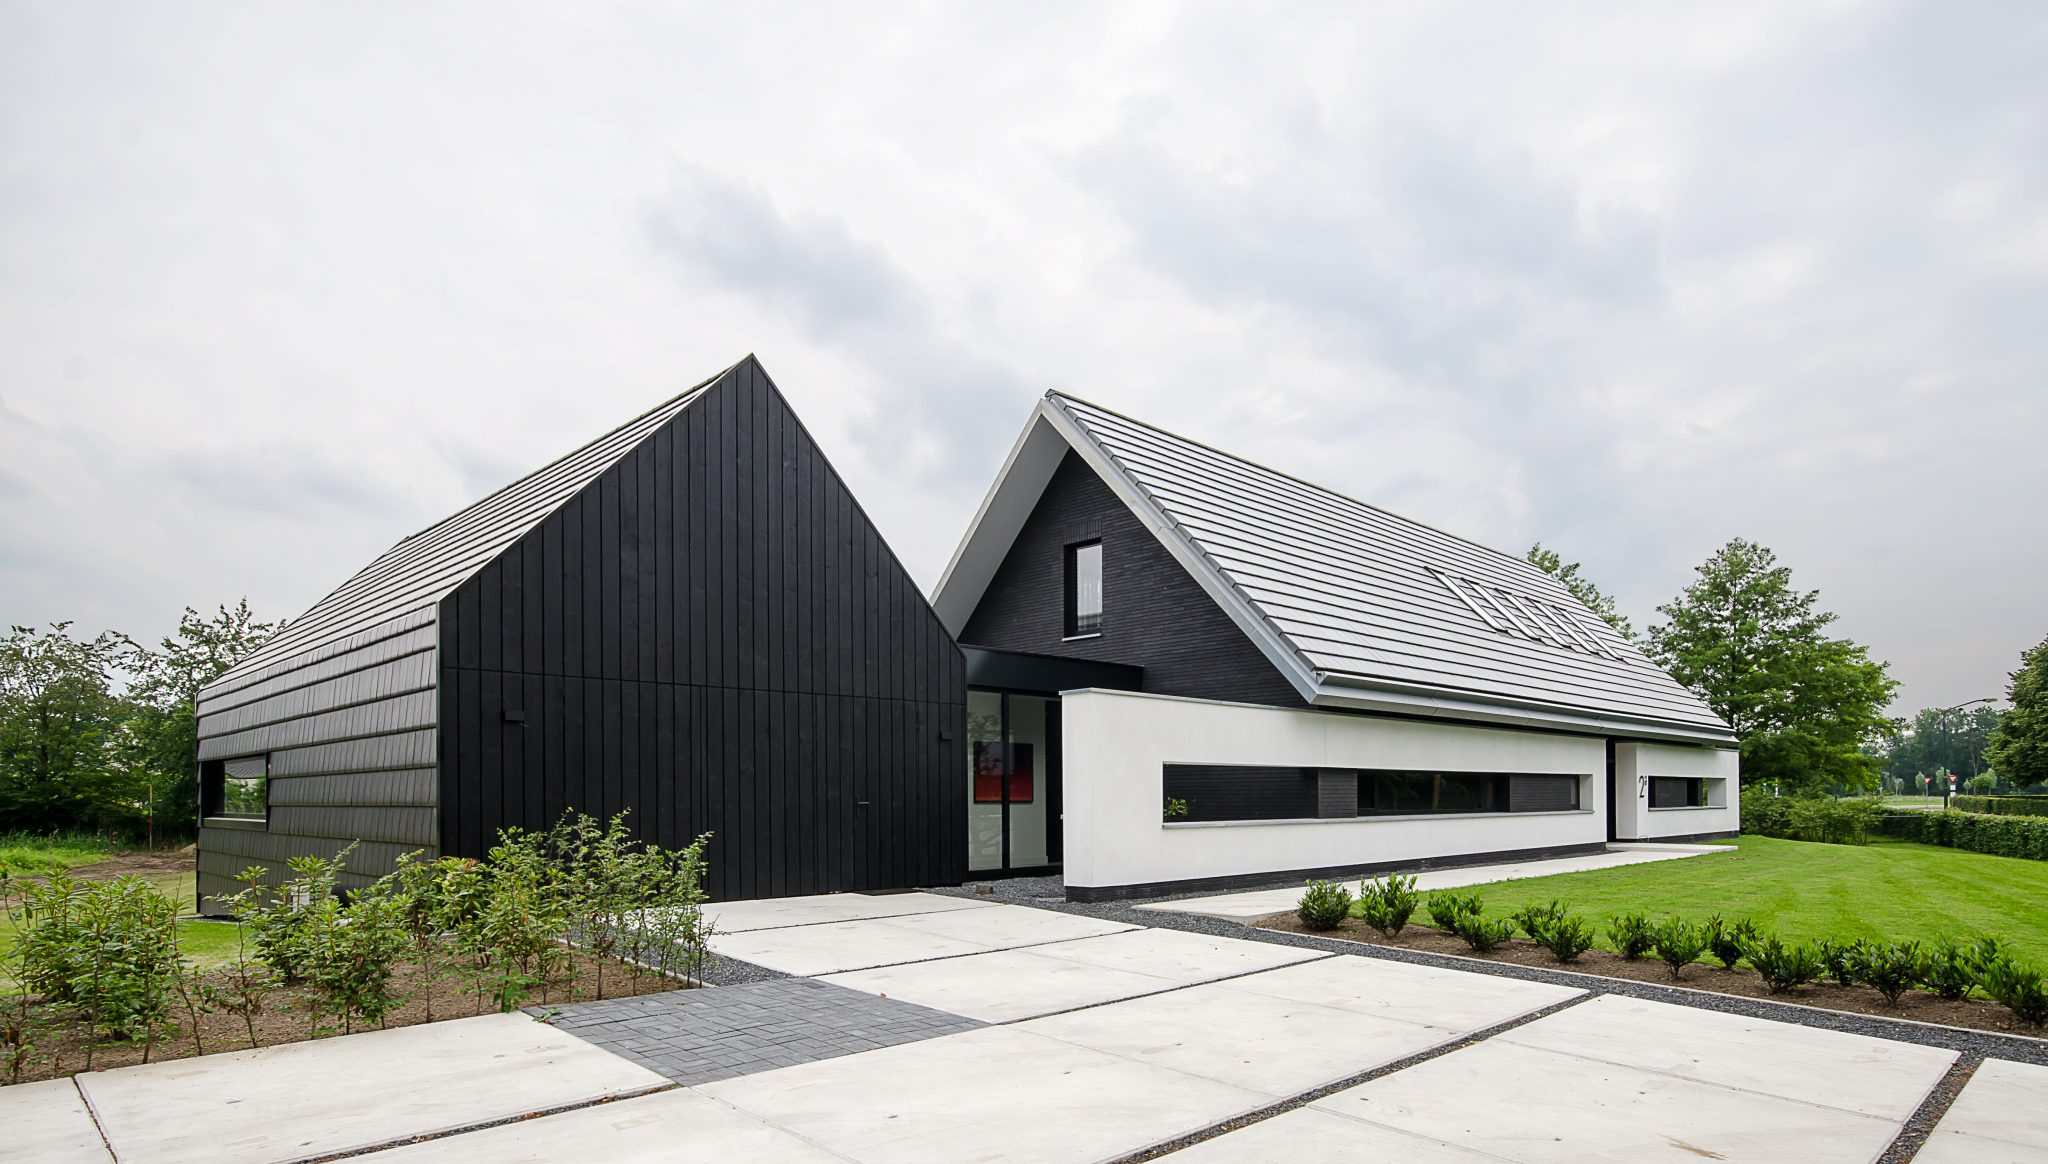 Houten Woning Ideeen : Rietgedekte woning bouwen jaro houtbouw